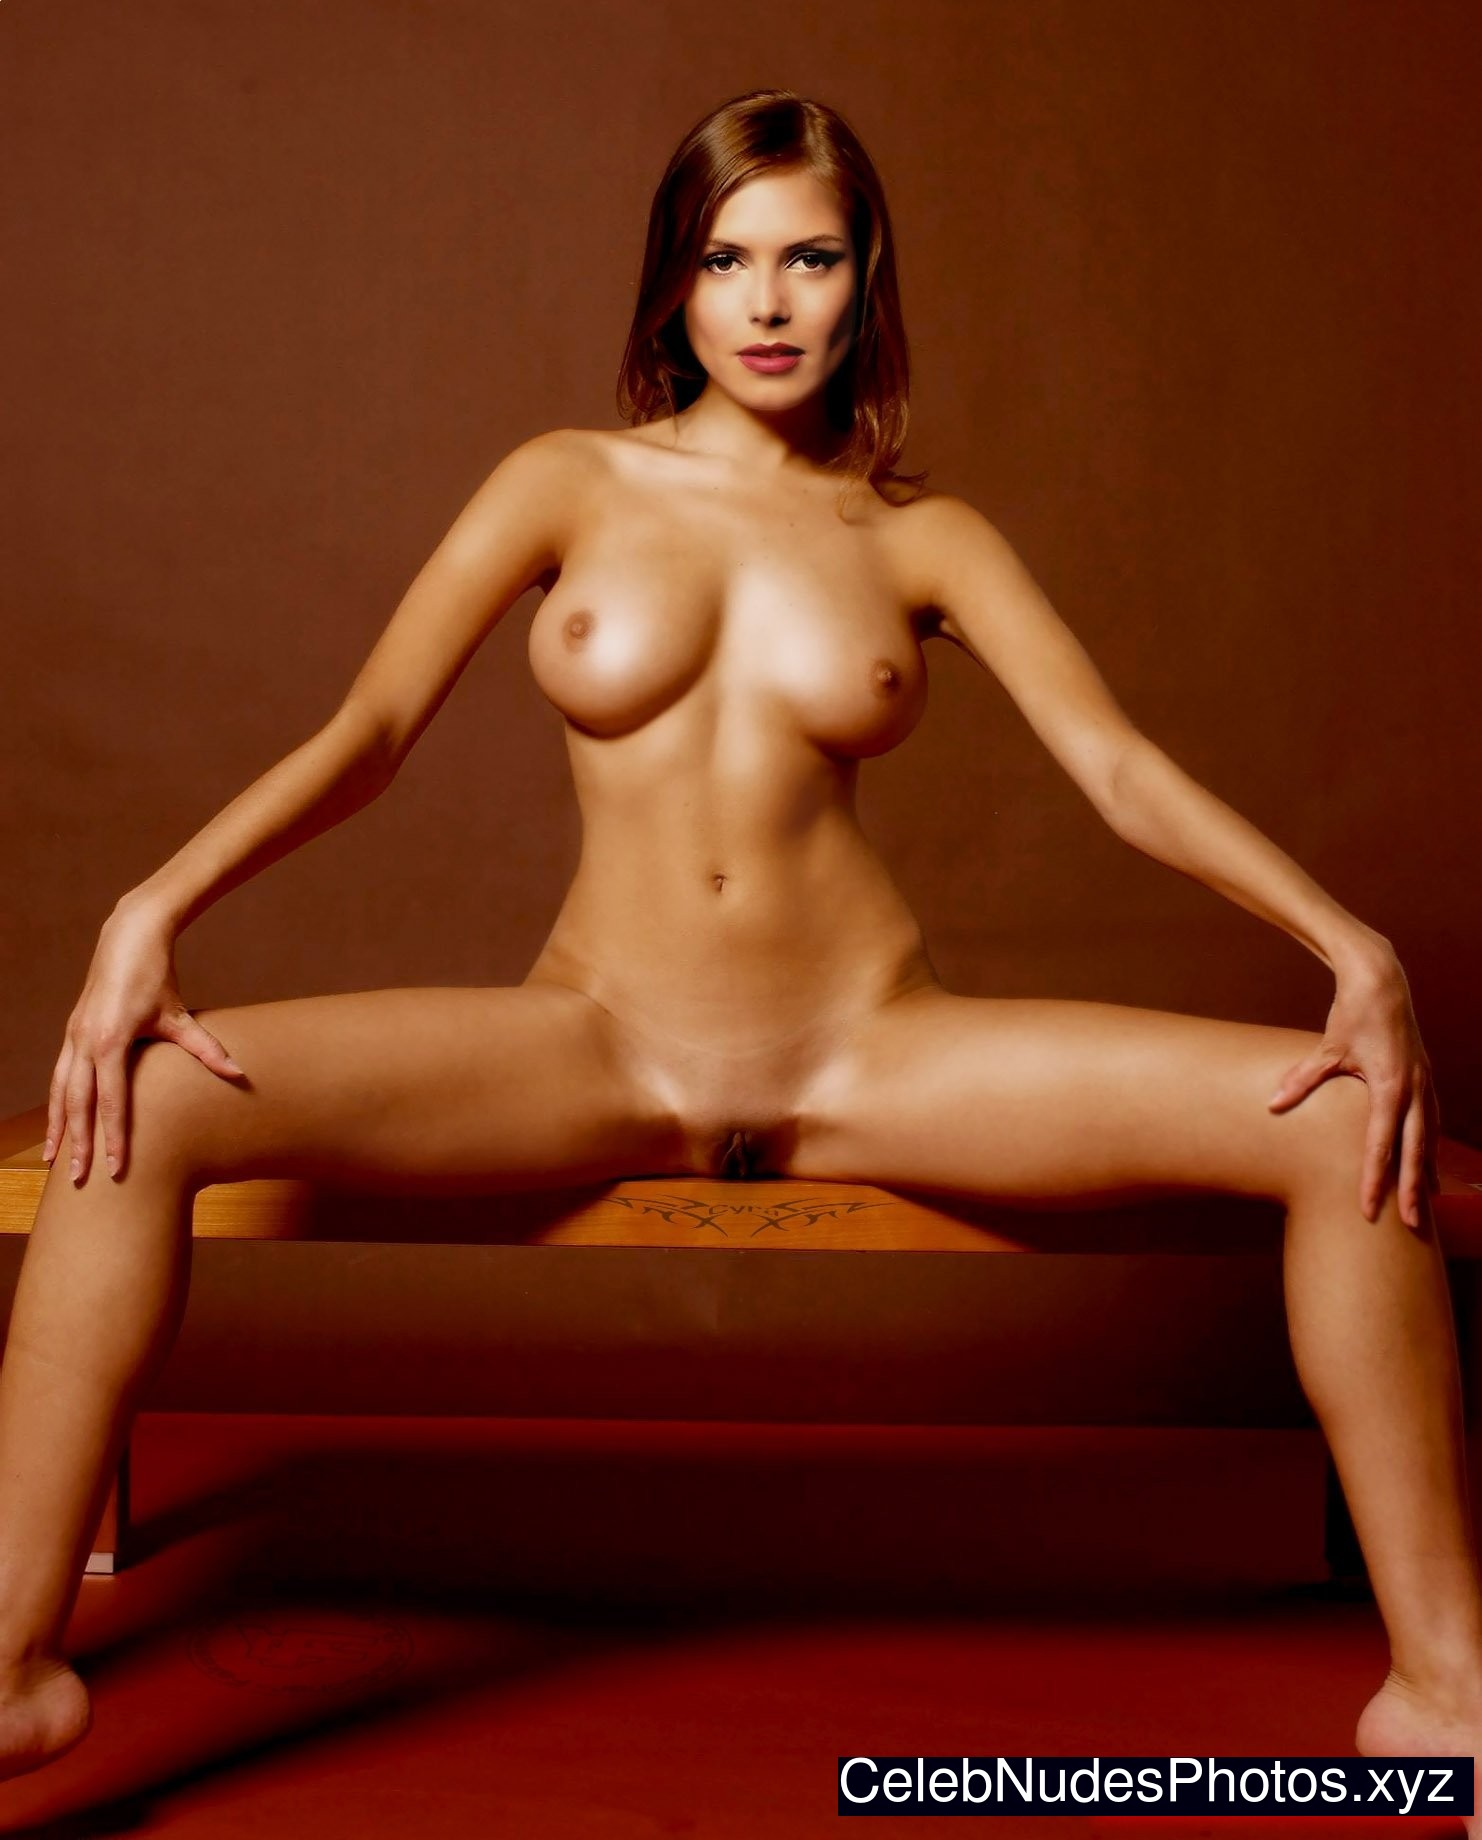 anna ivanovic nude pic